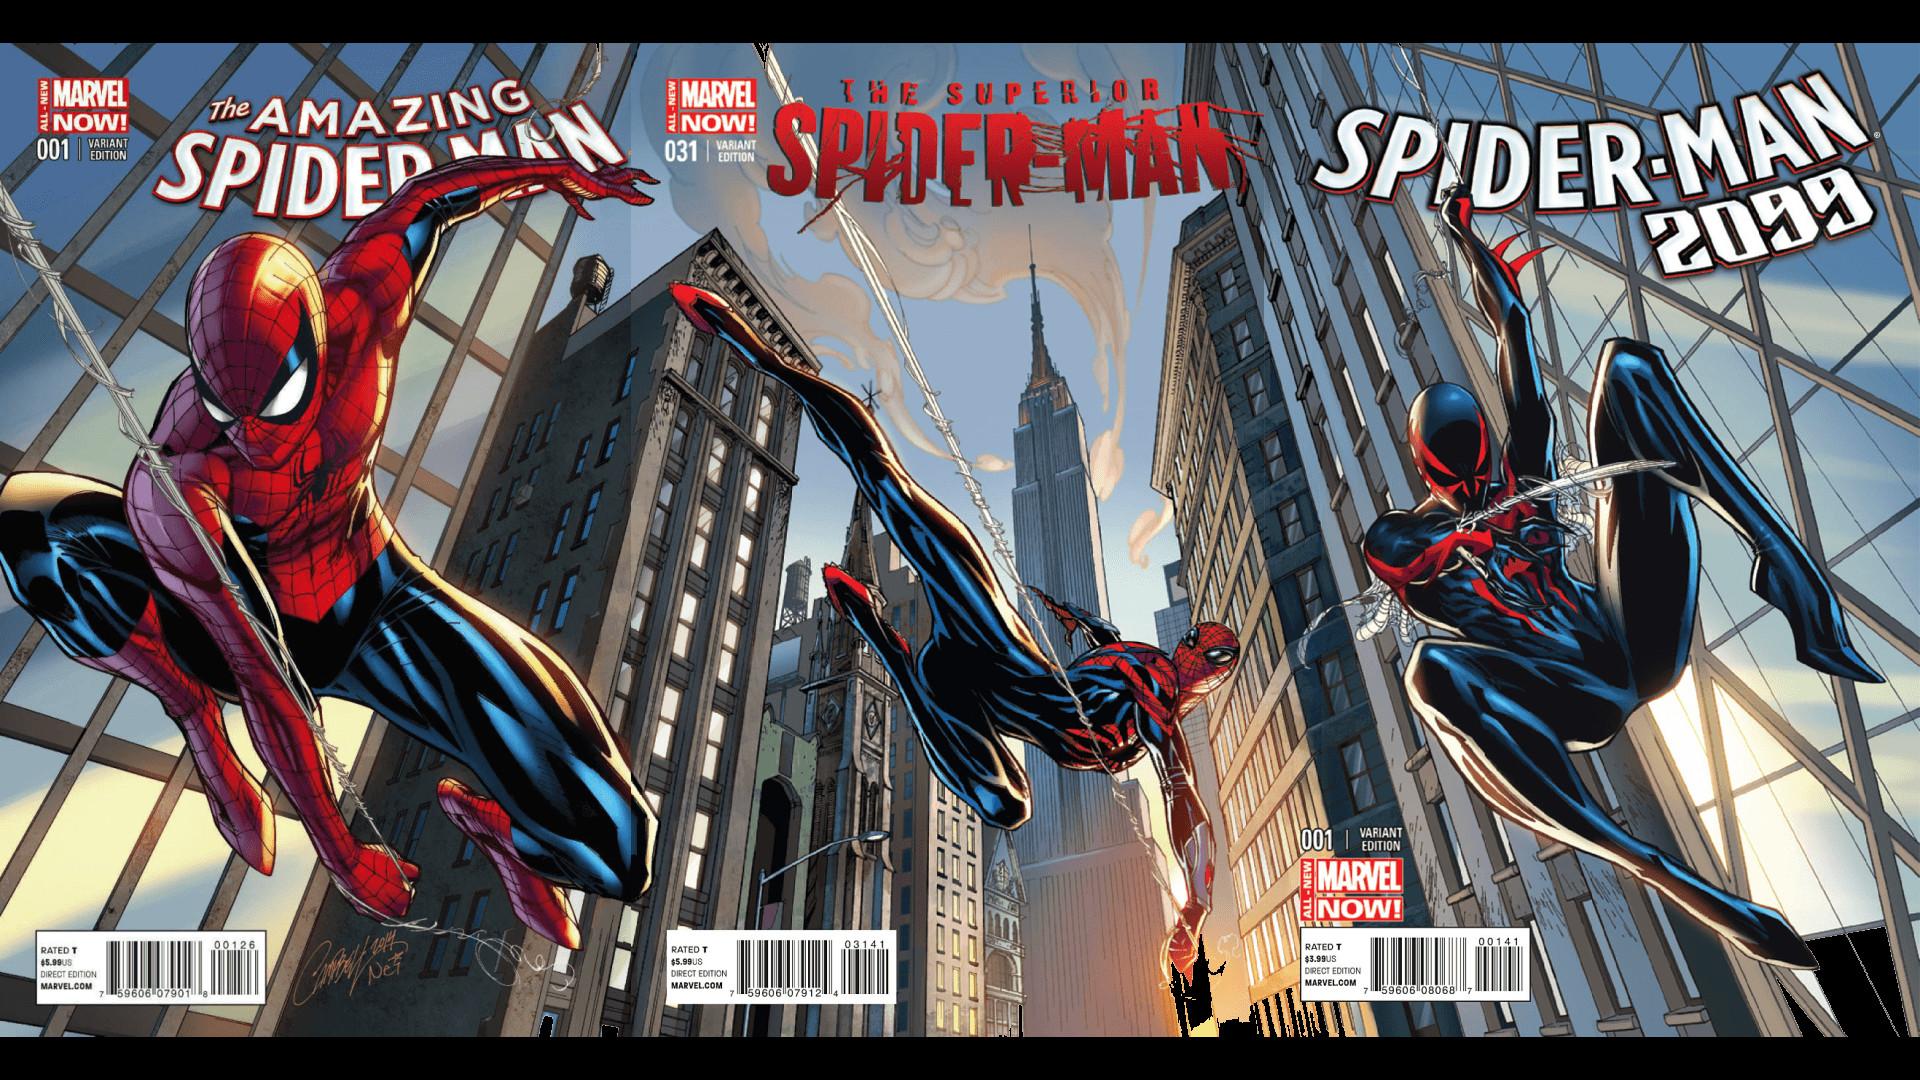 Marvel Comics <b>Spiderman Wallpaper</b> – WallpaperSafari